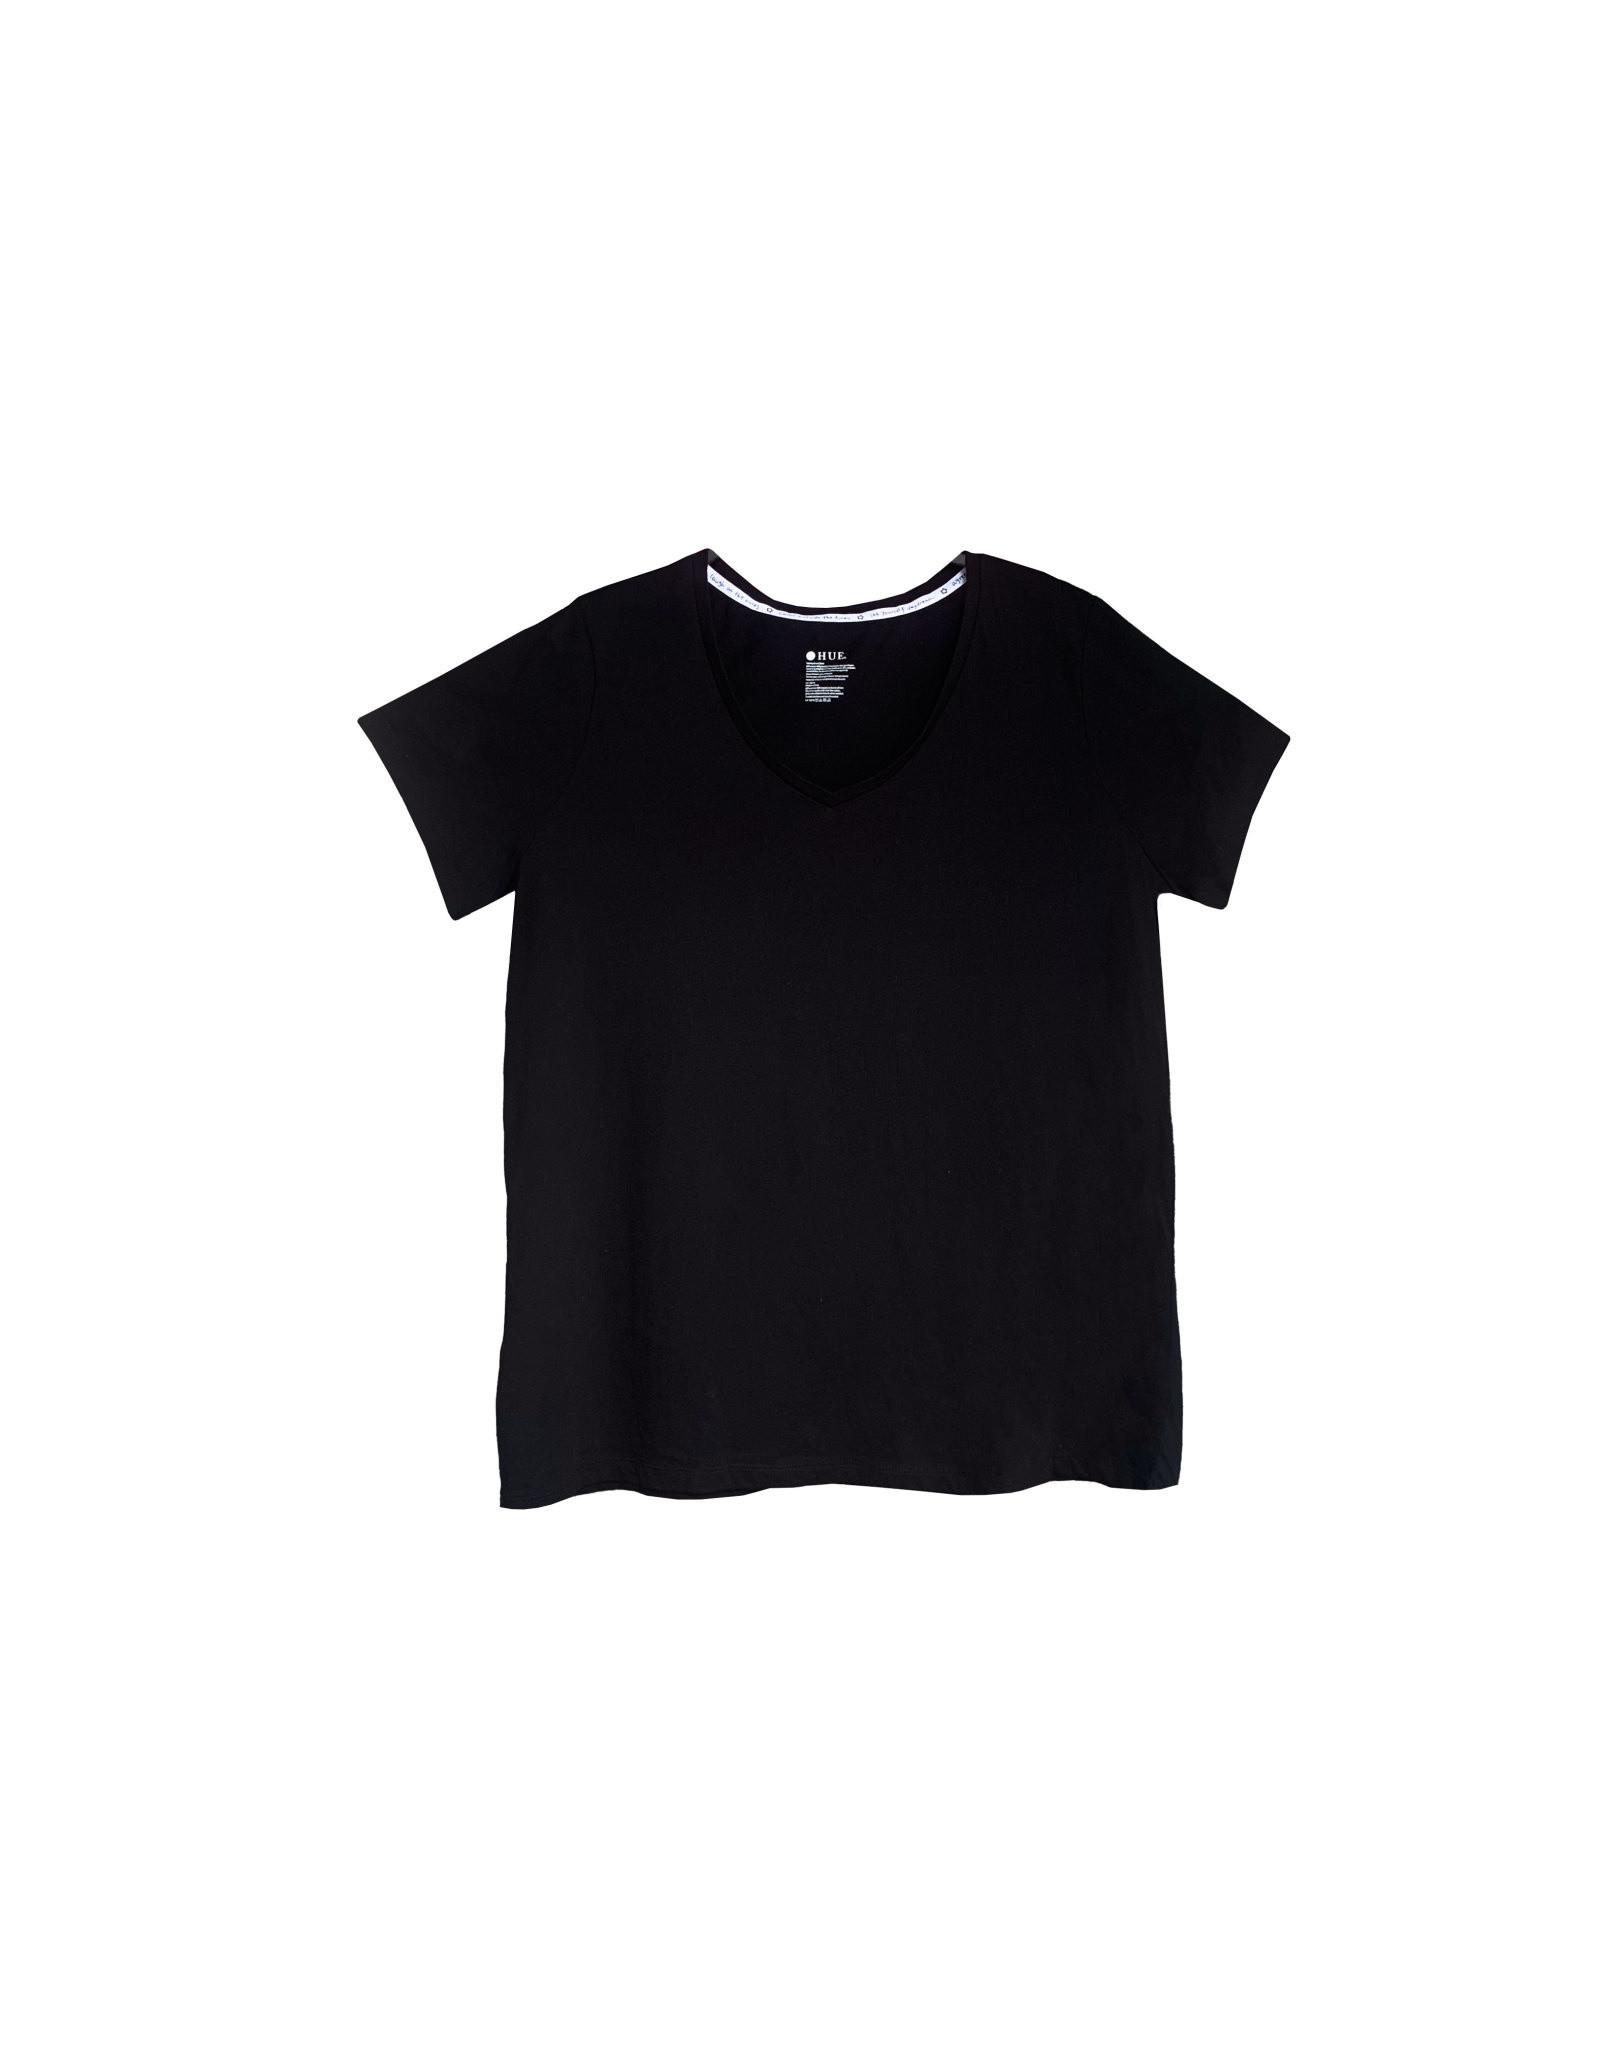 HUE HUE  Black  T-Shirt  Size XL